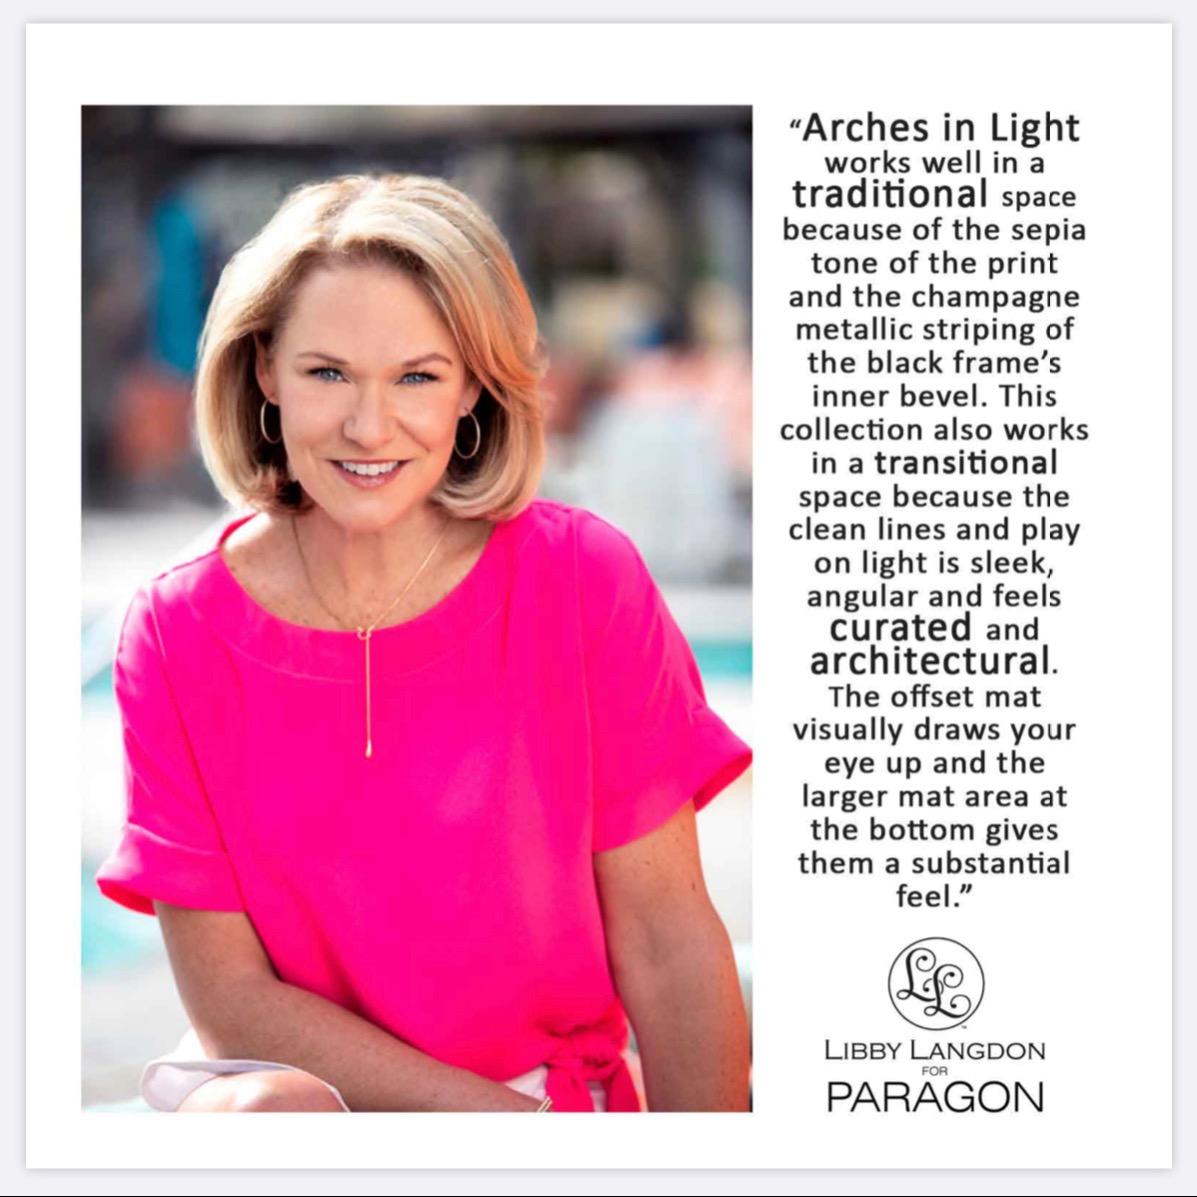 Libby Langdon for Paragon